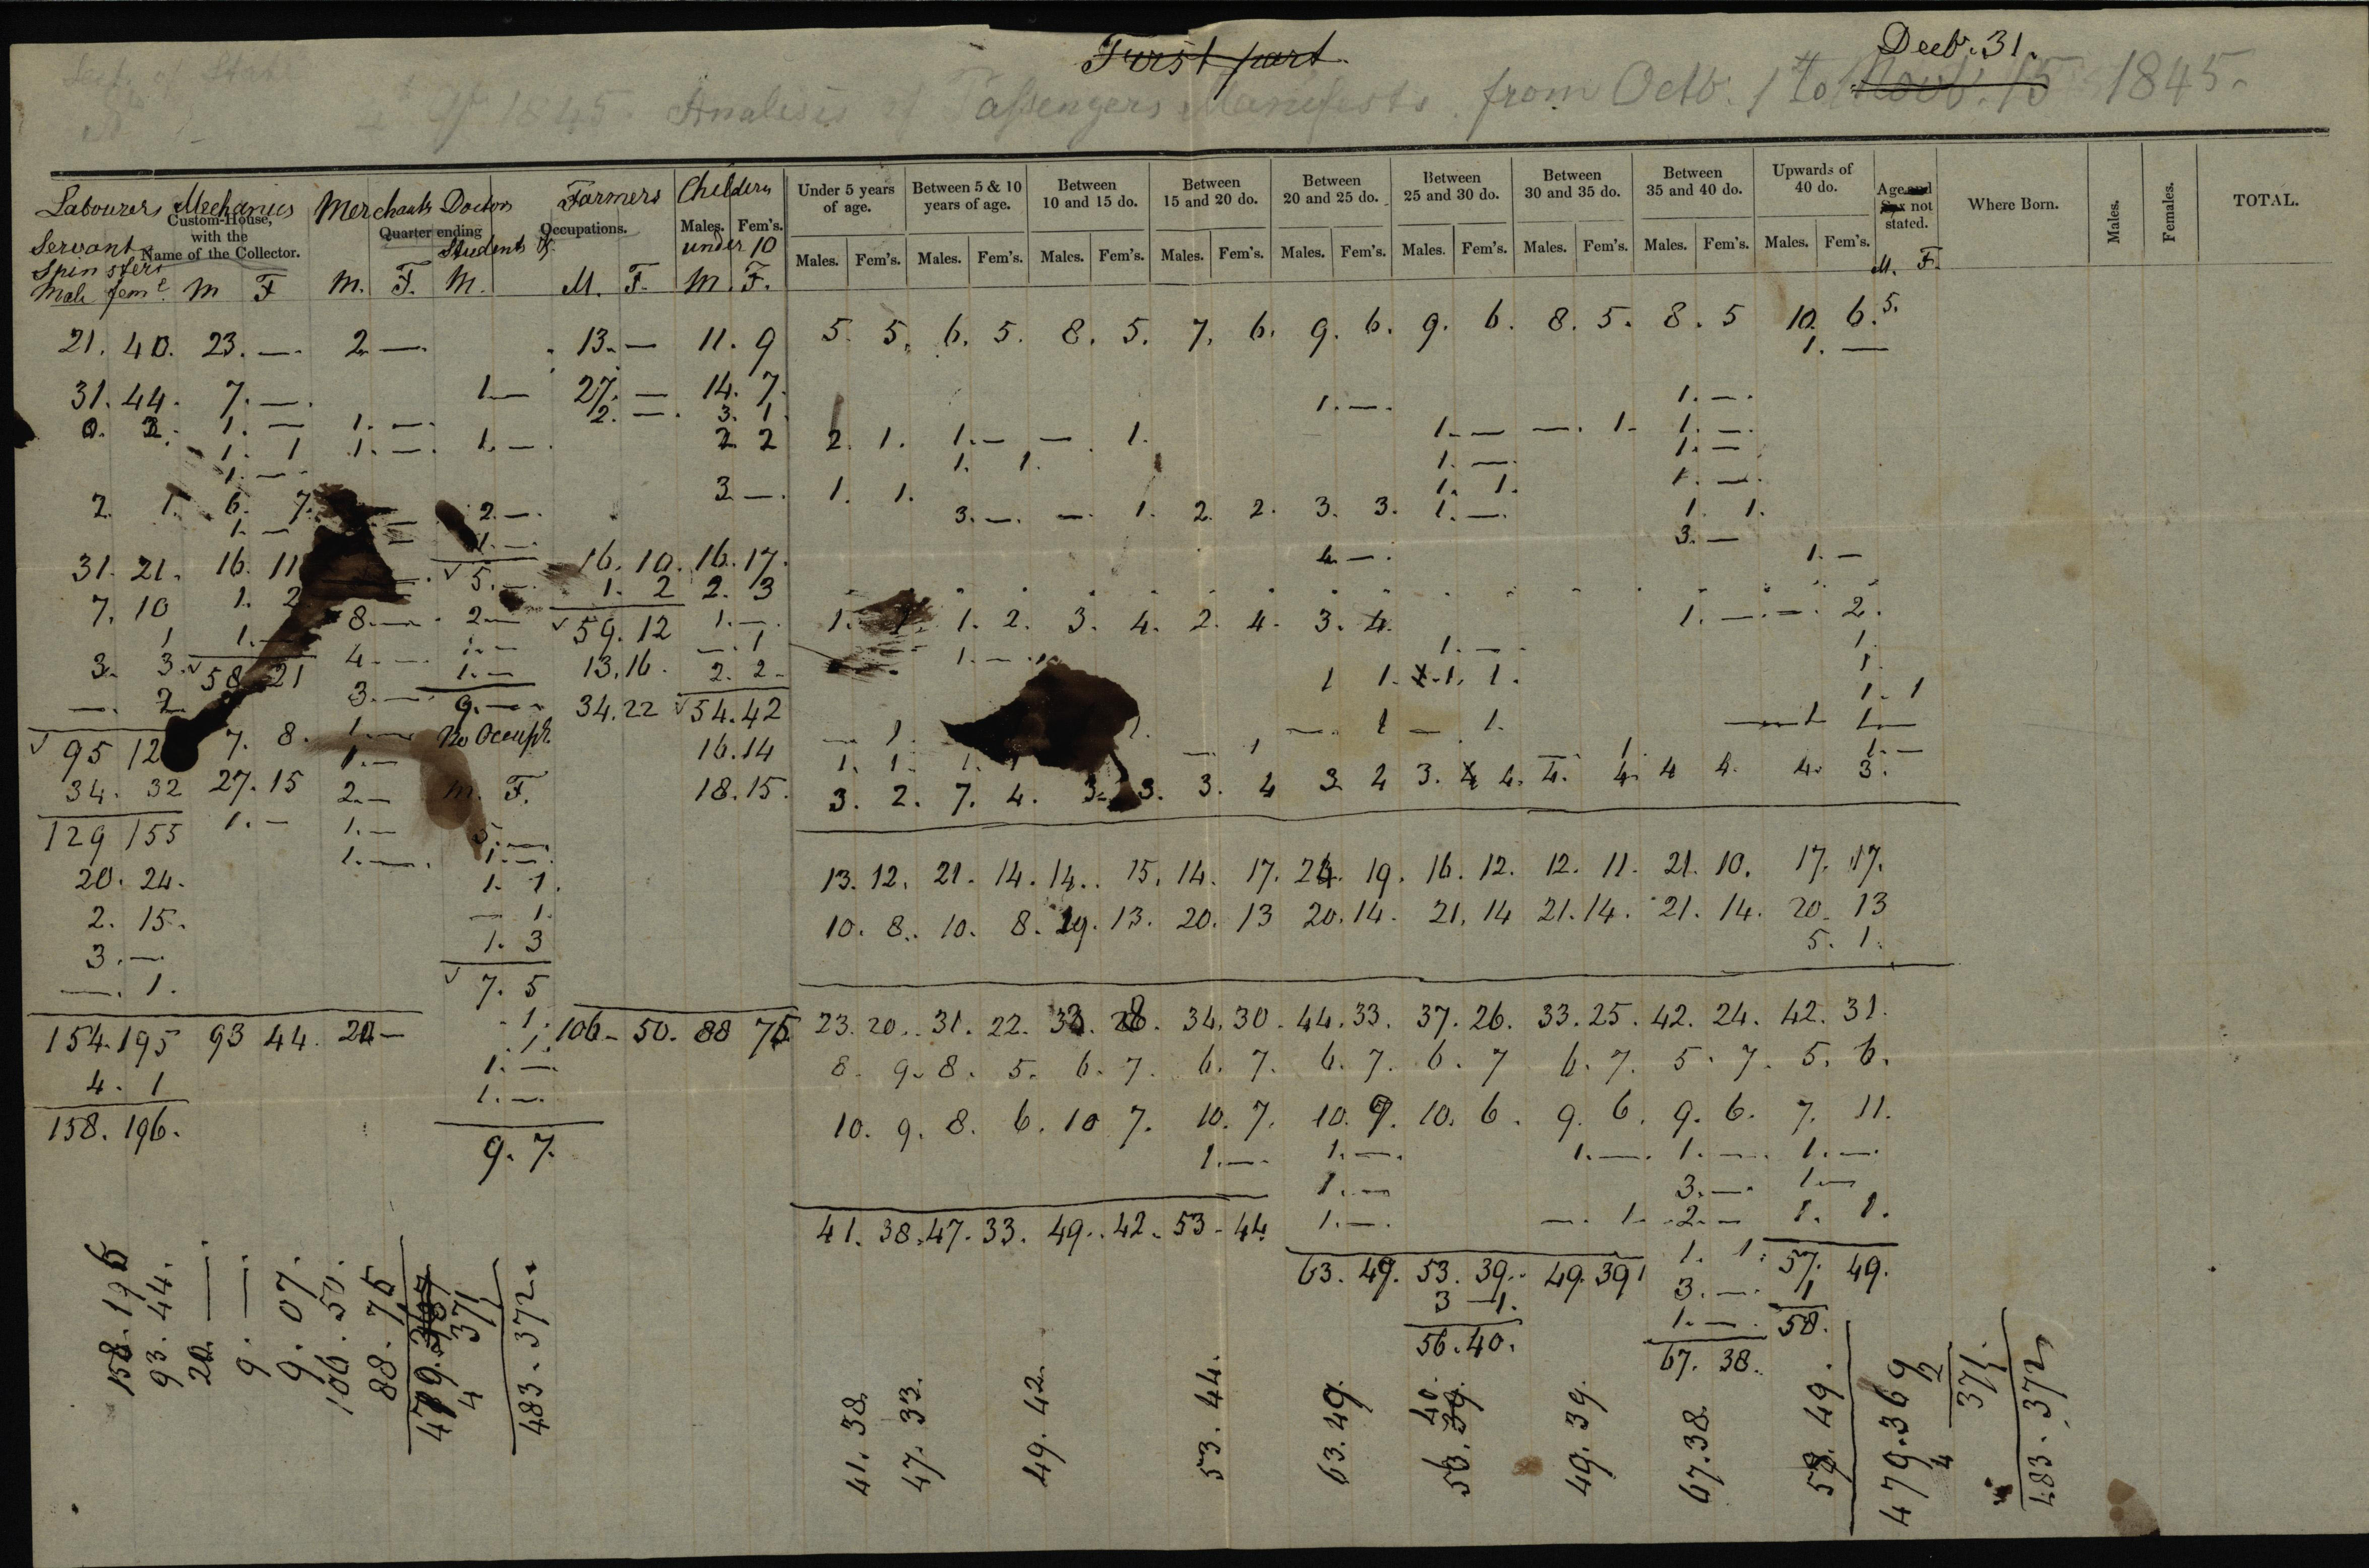 Analysis of passenger manifests, 1845